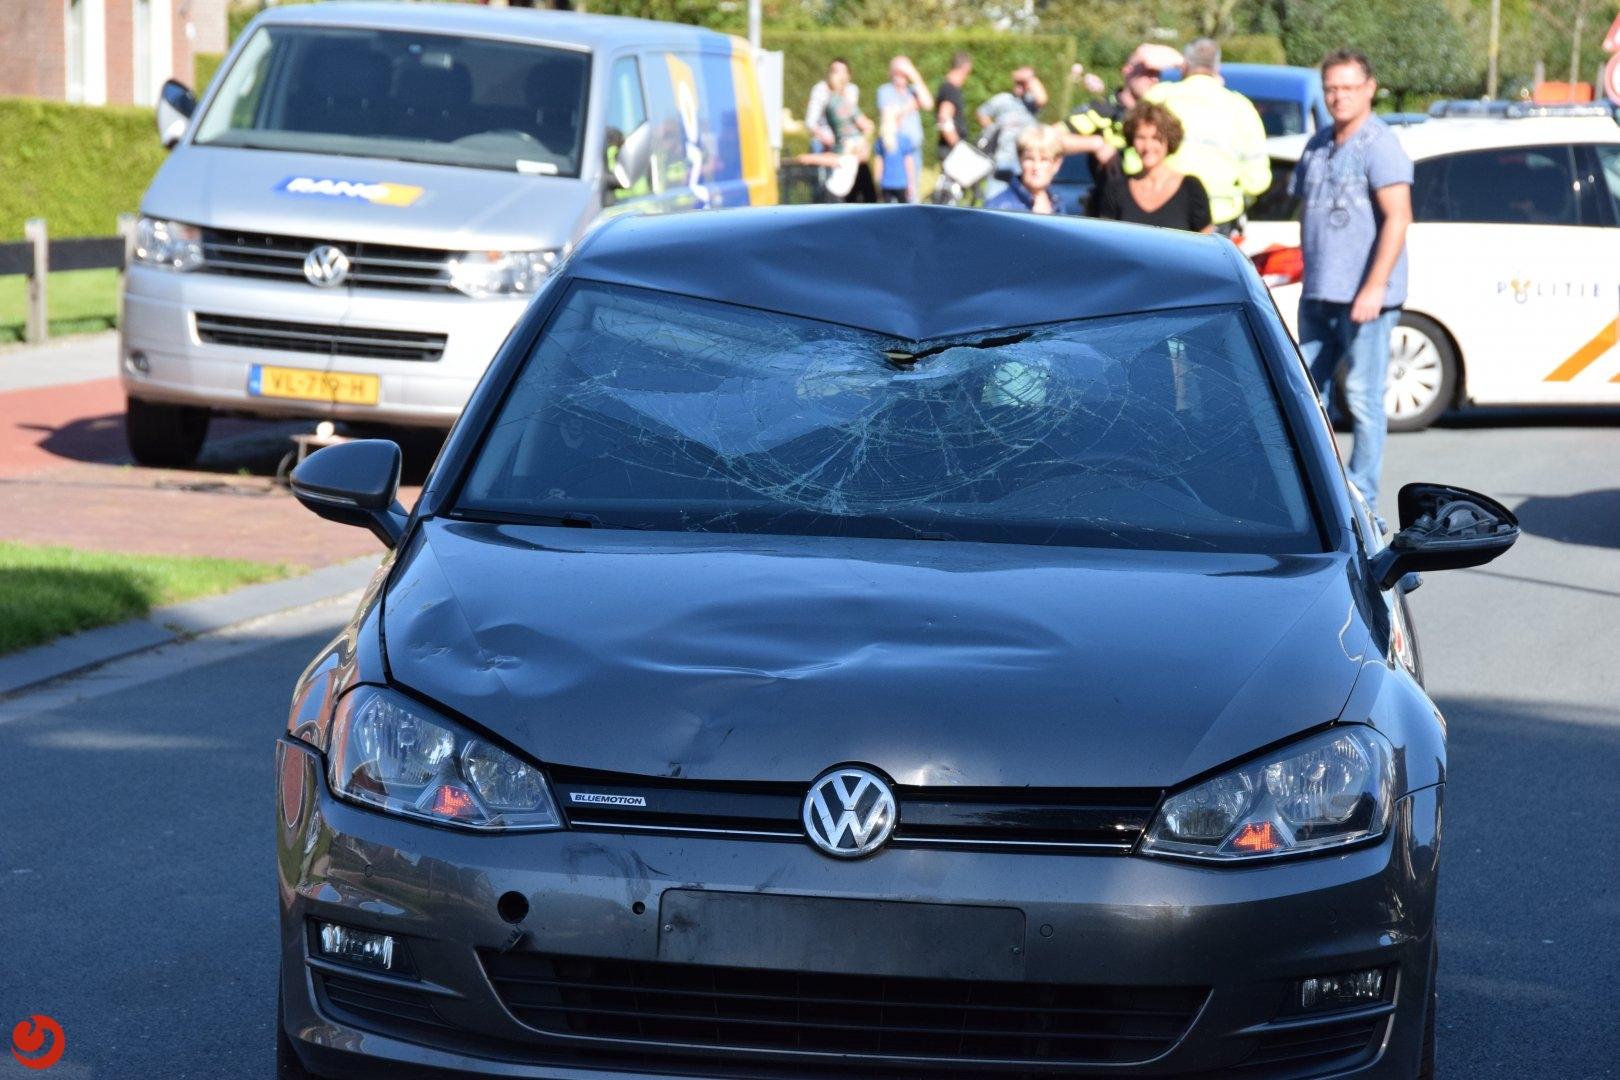 Fietsster ernstig gewond na botsing met auto